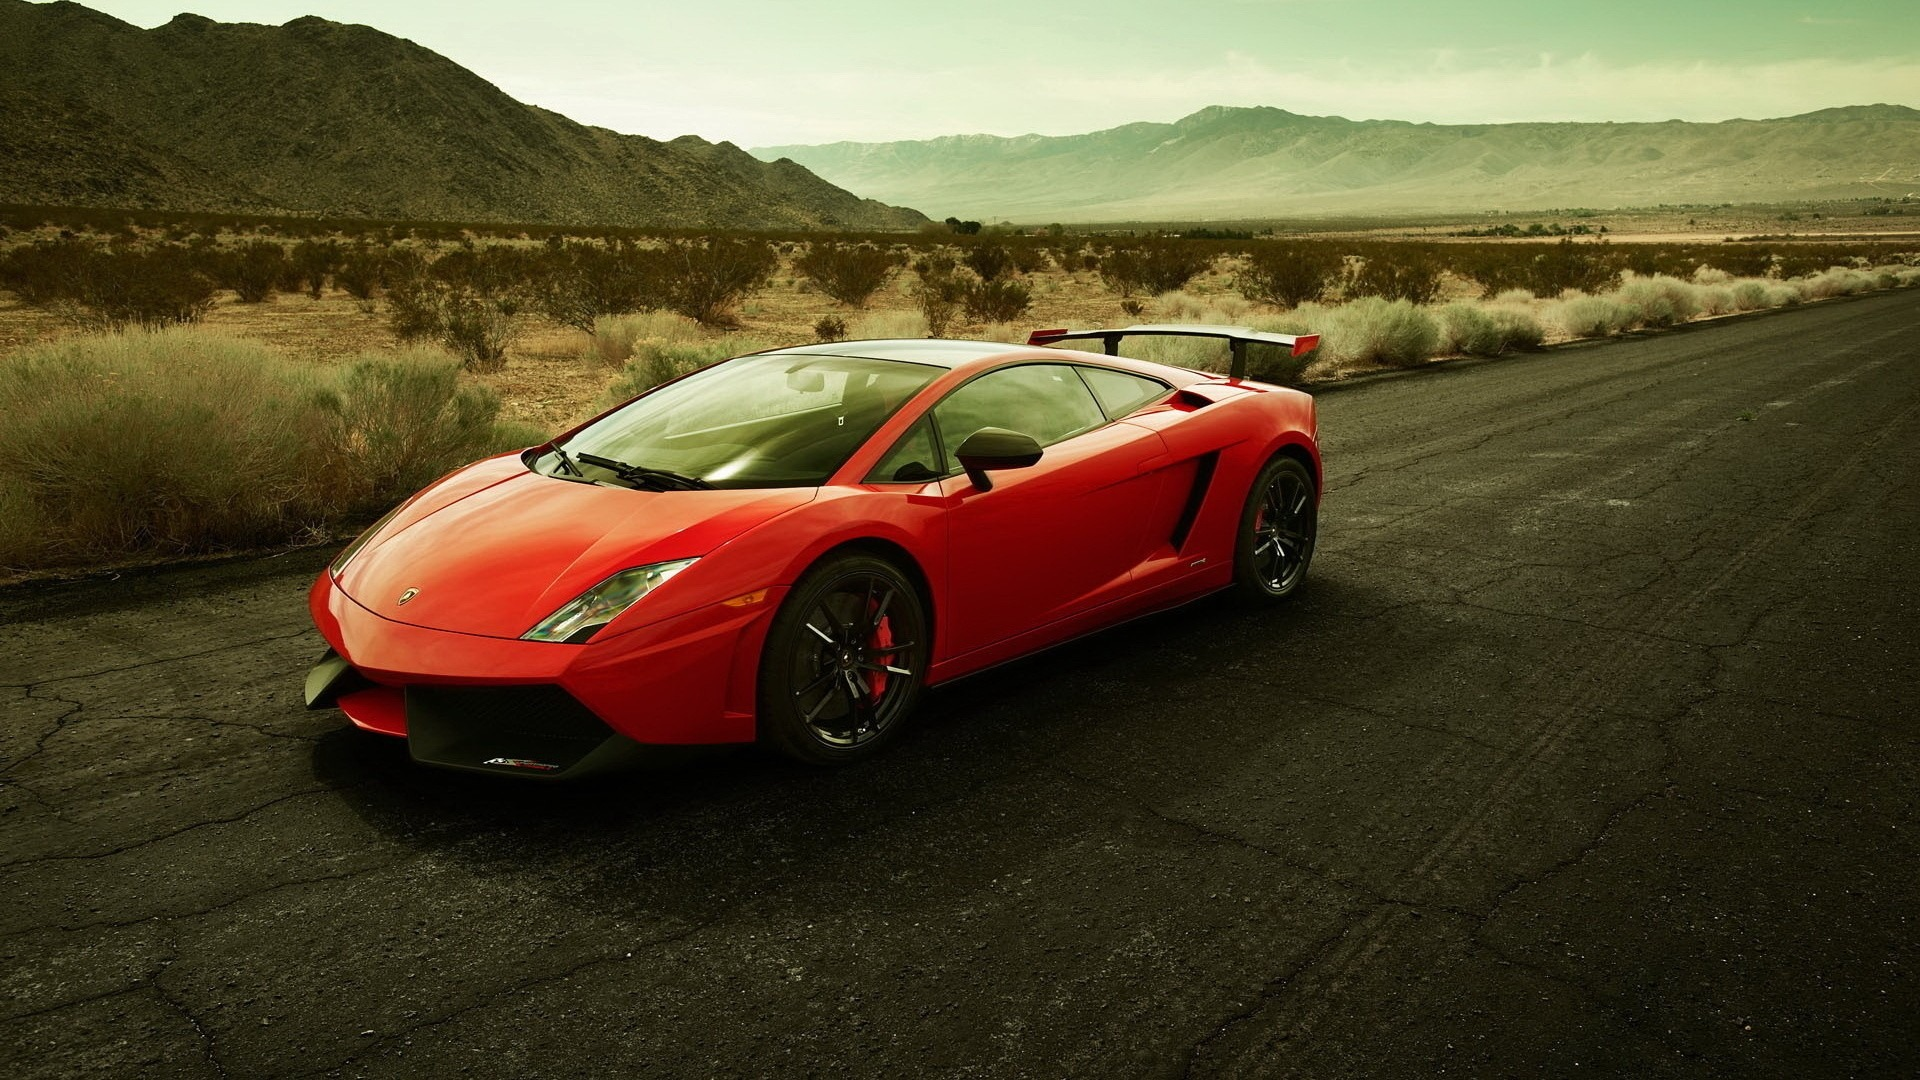 Lamborghini Gallardo Background